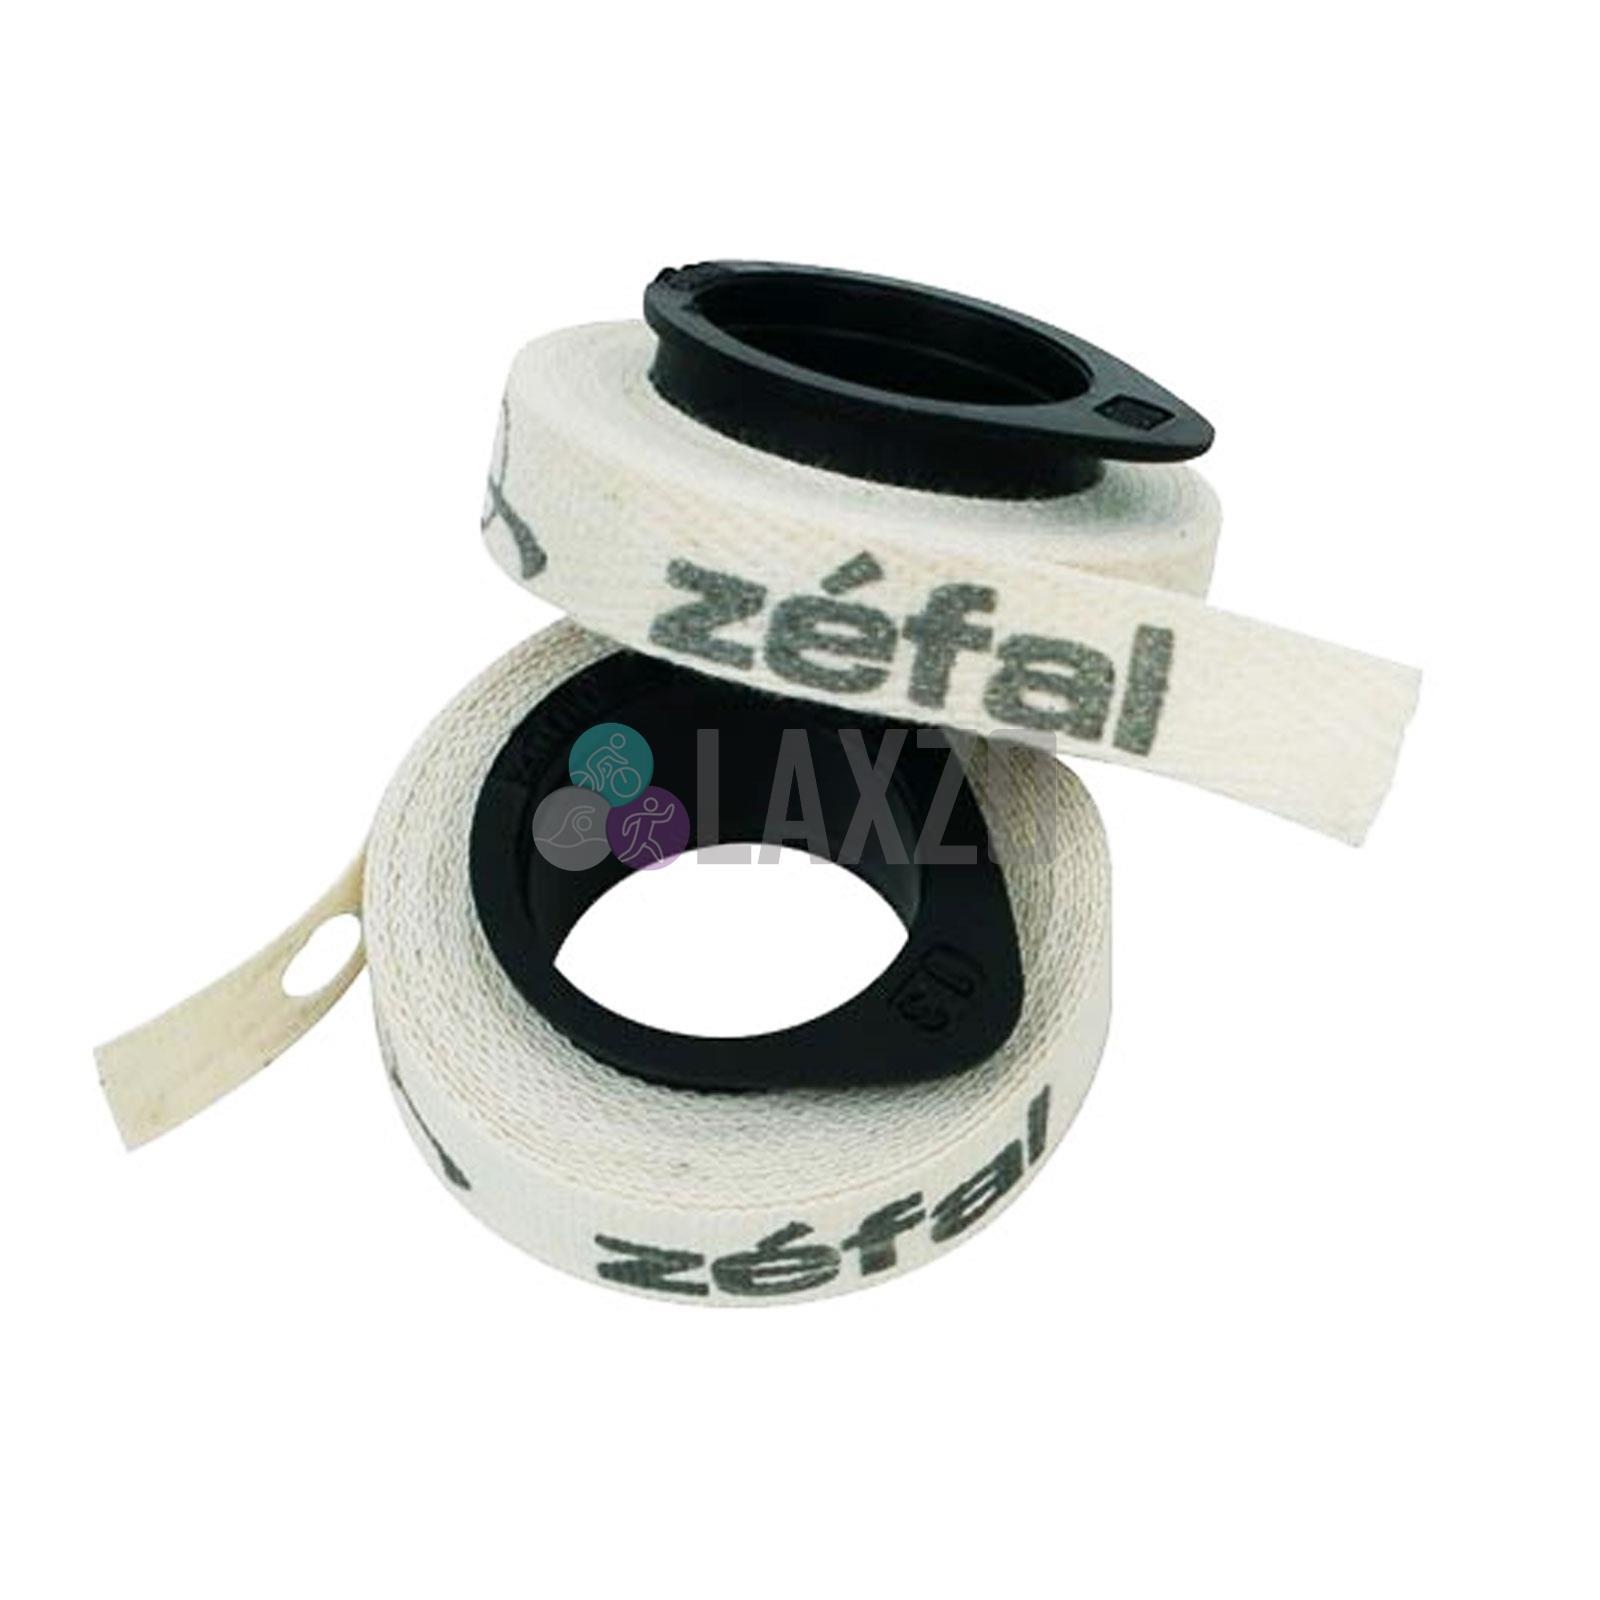 Zefal Rim Tape-17mm-Rim Cloth-700c-Bike Wheel Strip-New-1 Roll